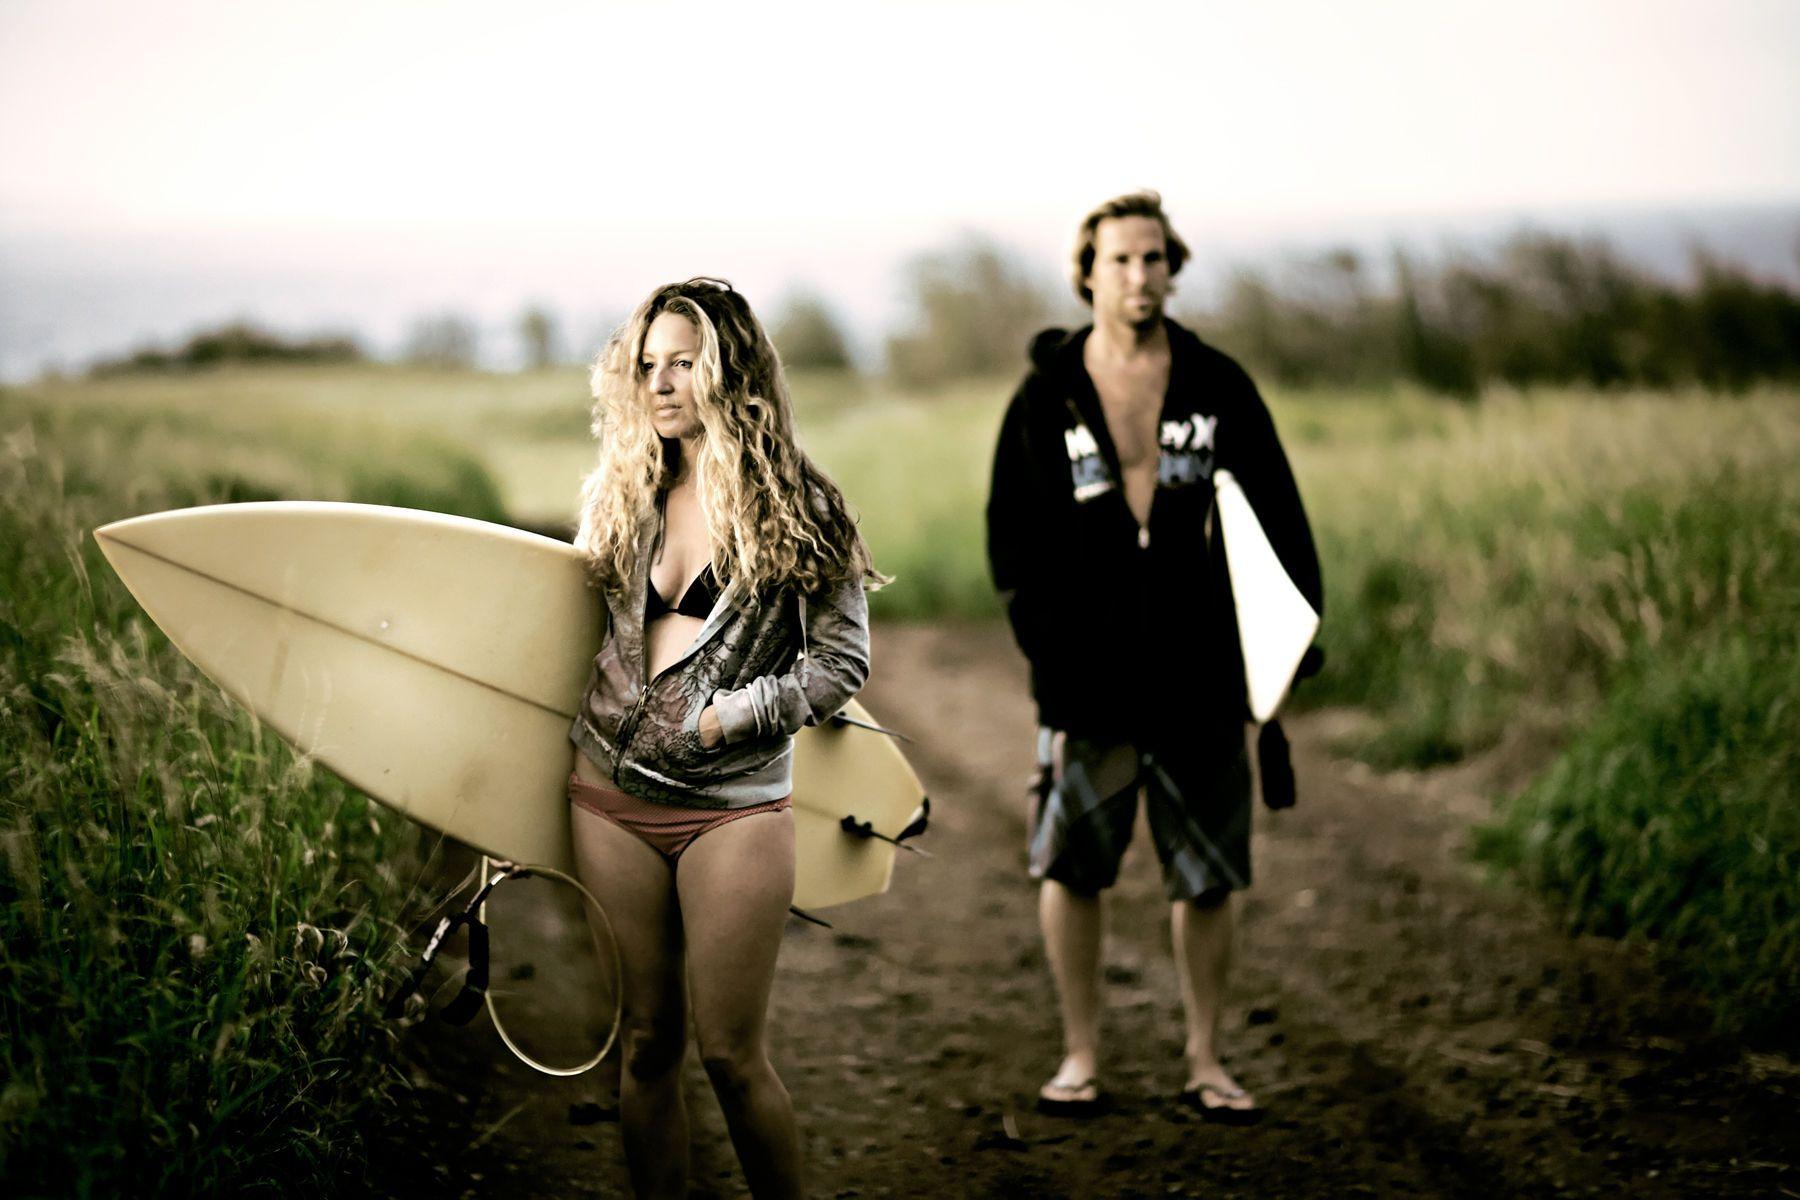 Apres surf. Maui, Hawaii